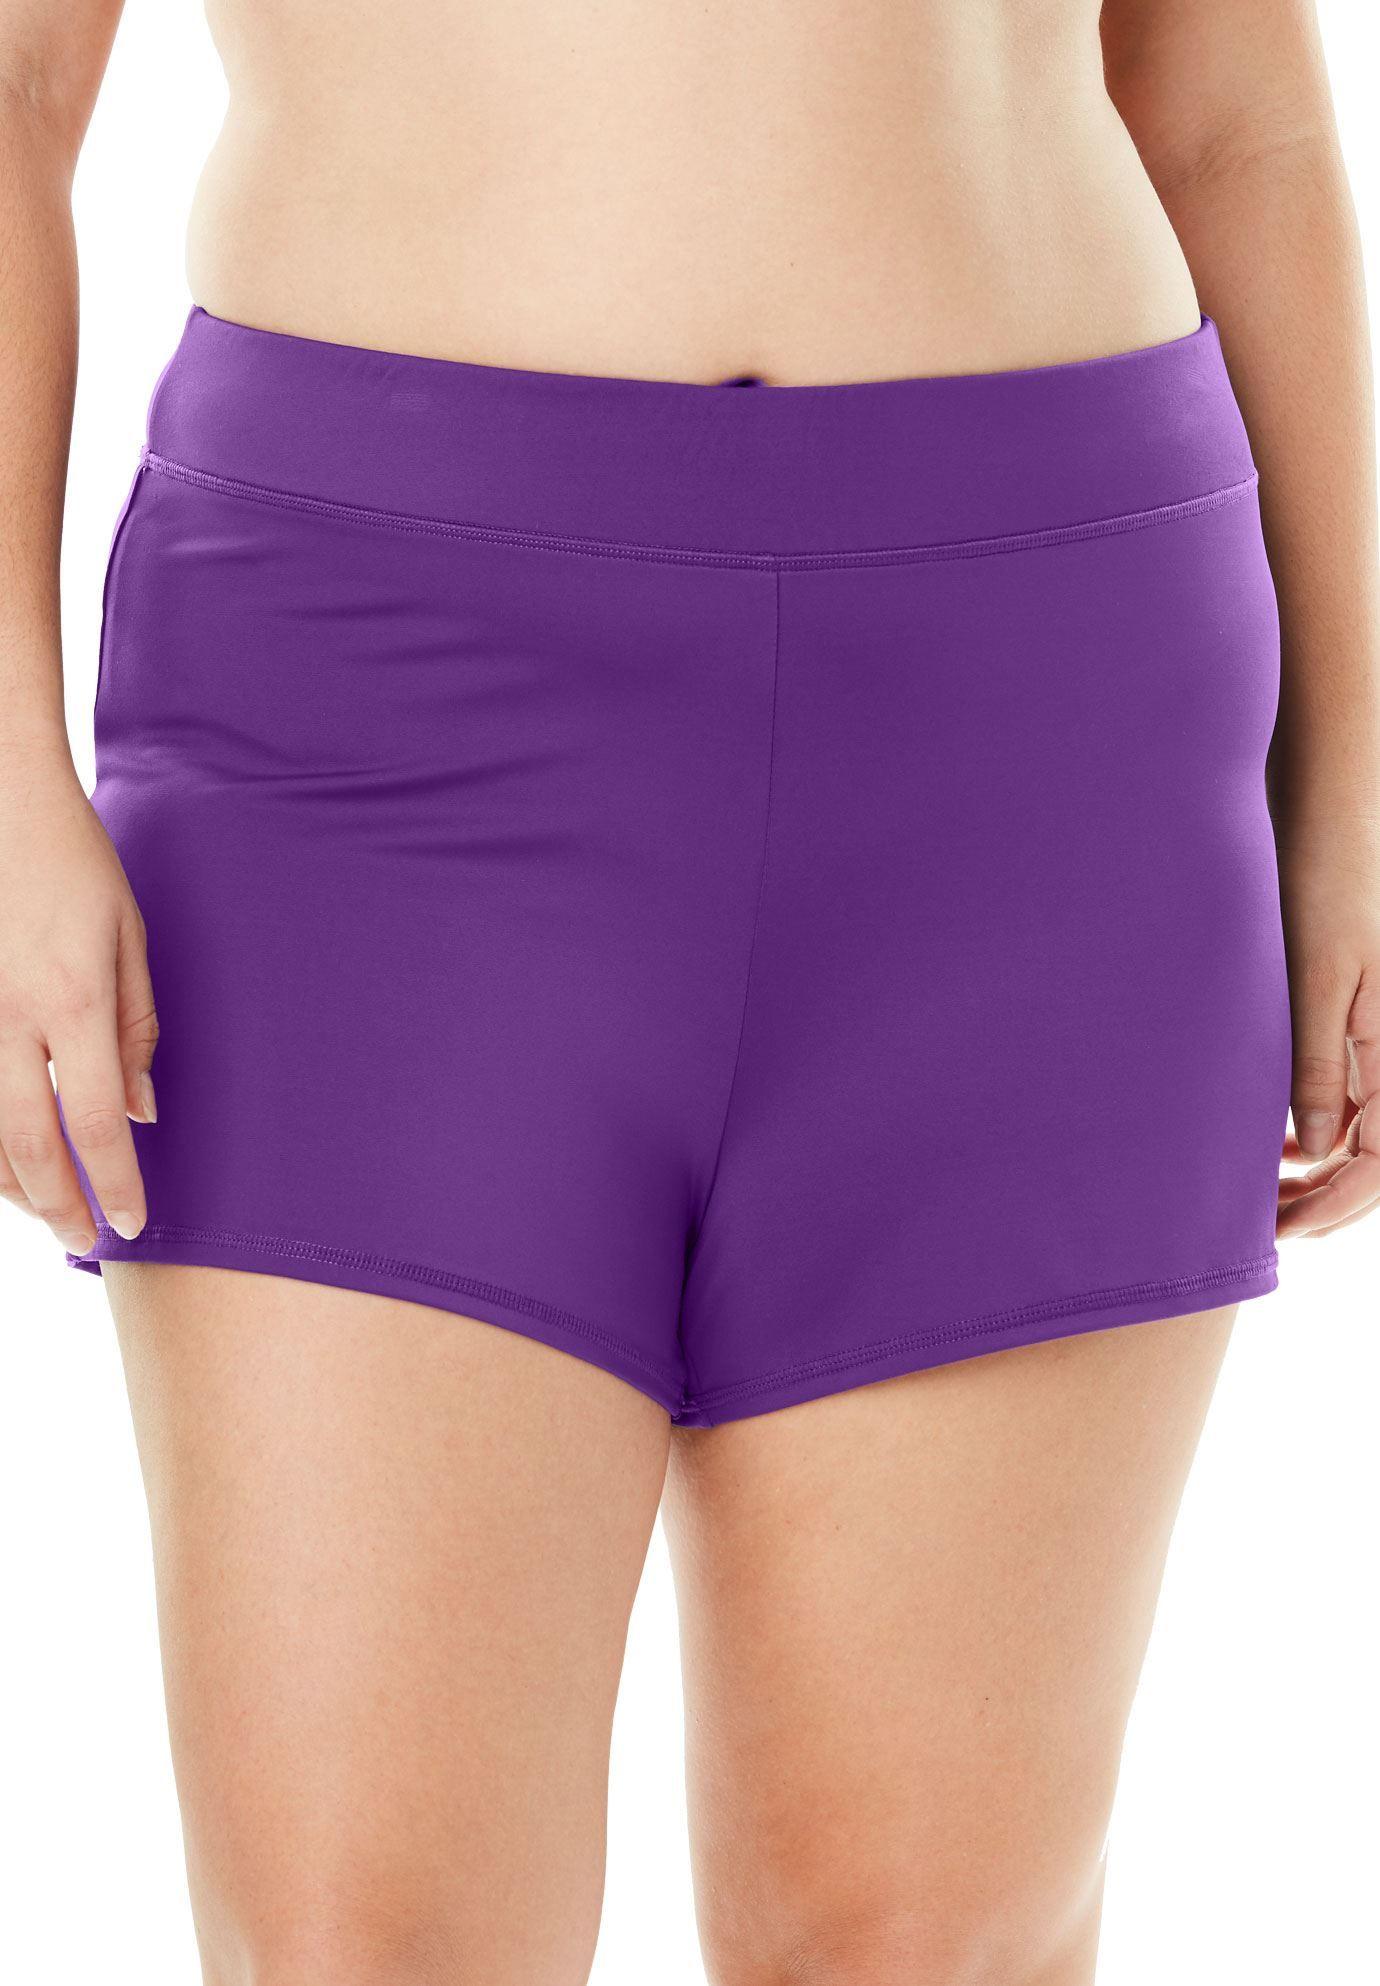 83bc67bdd5479 Wide Band Swim Shorts - Women's Plus Size Clothing | Products | Swim ...